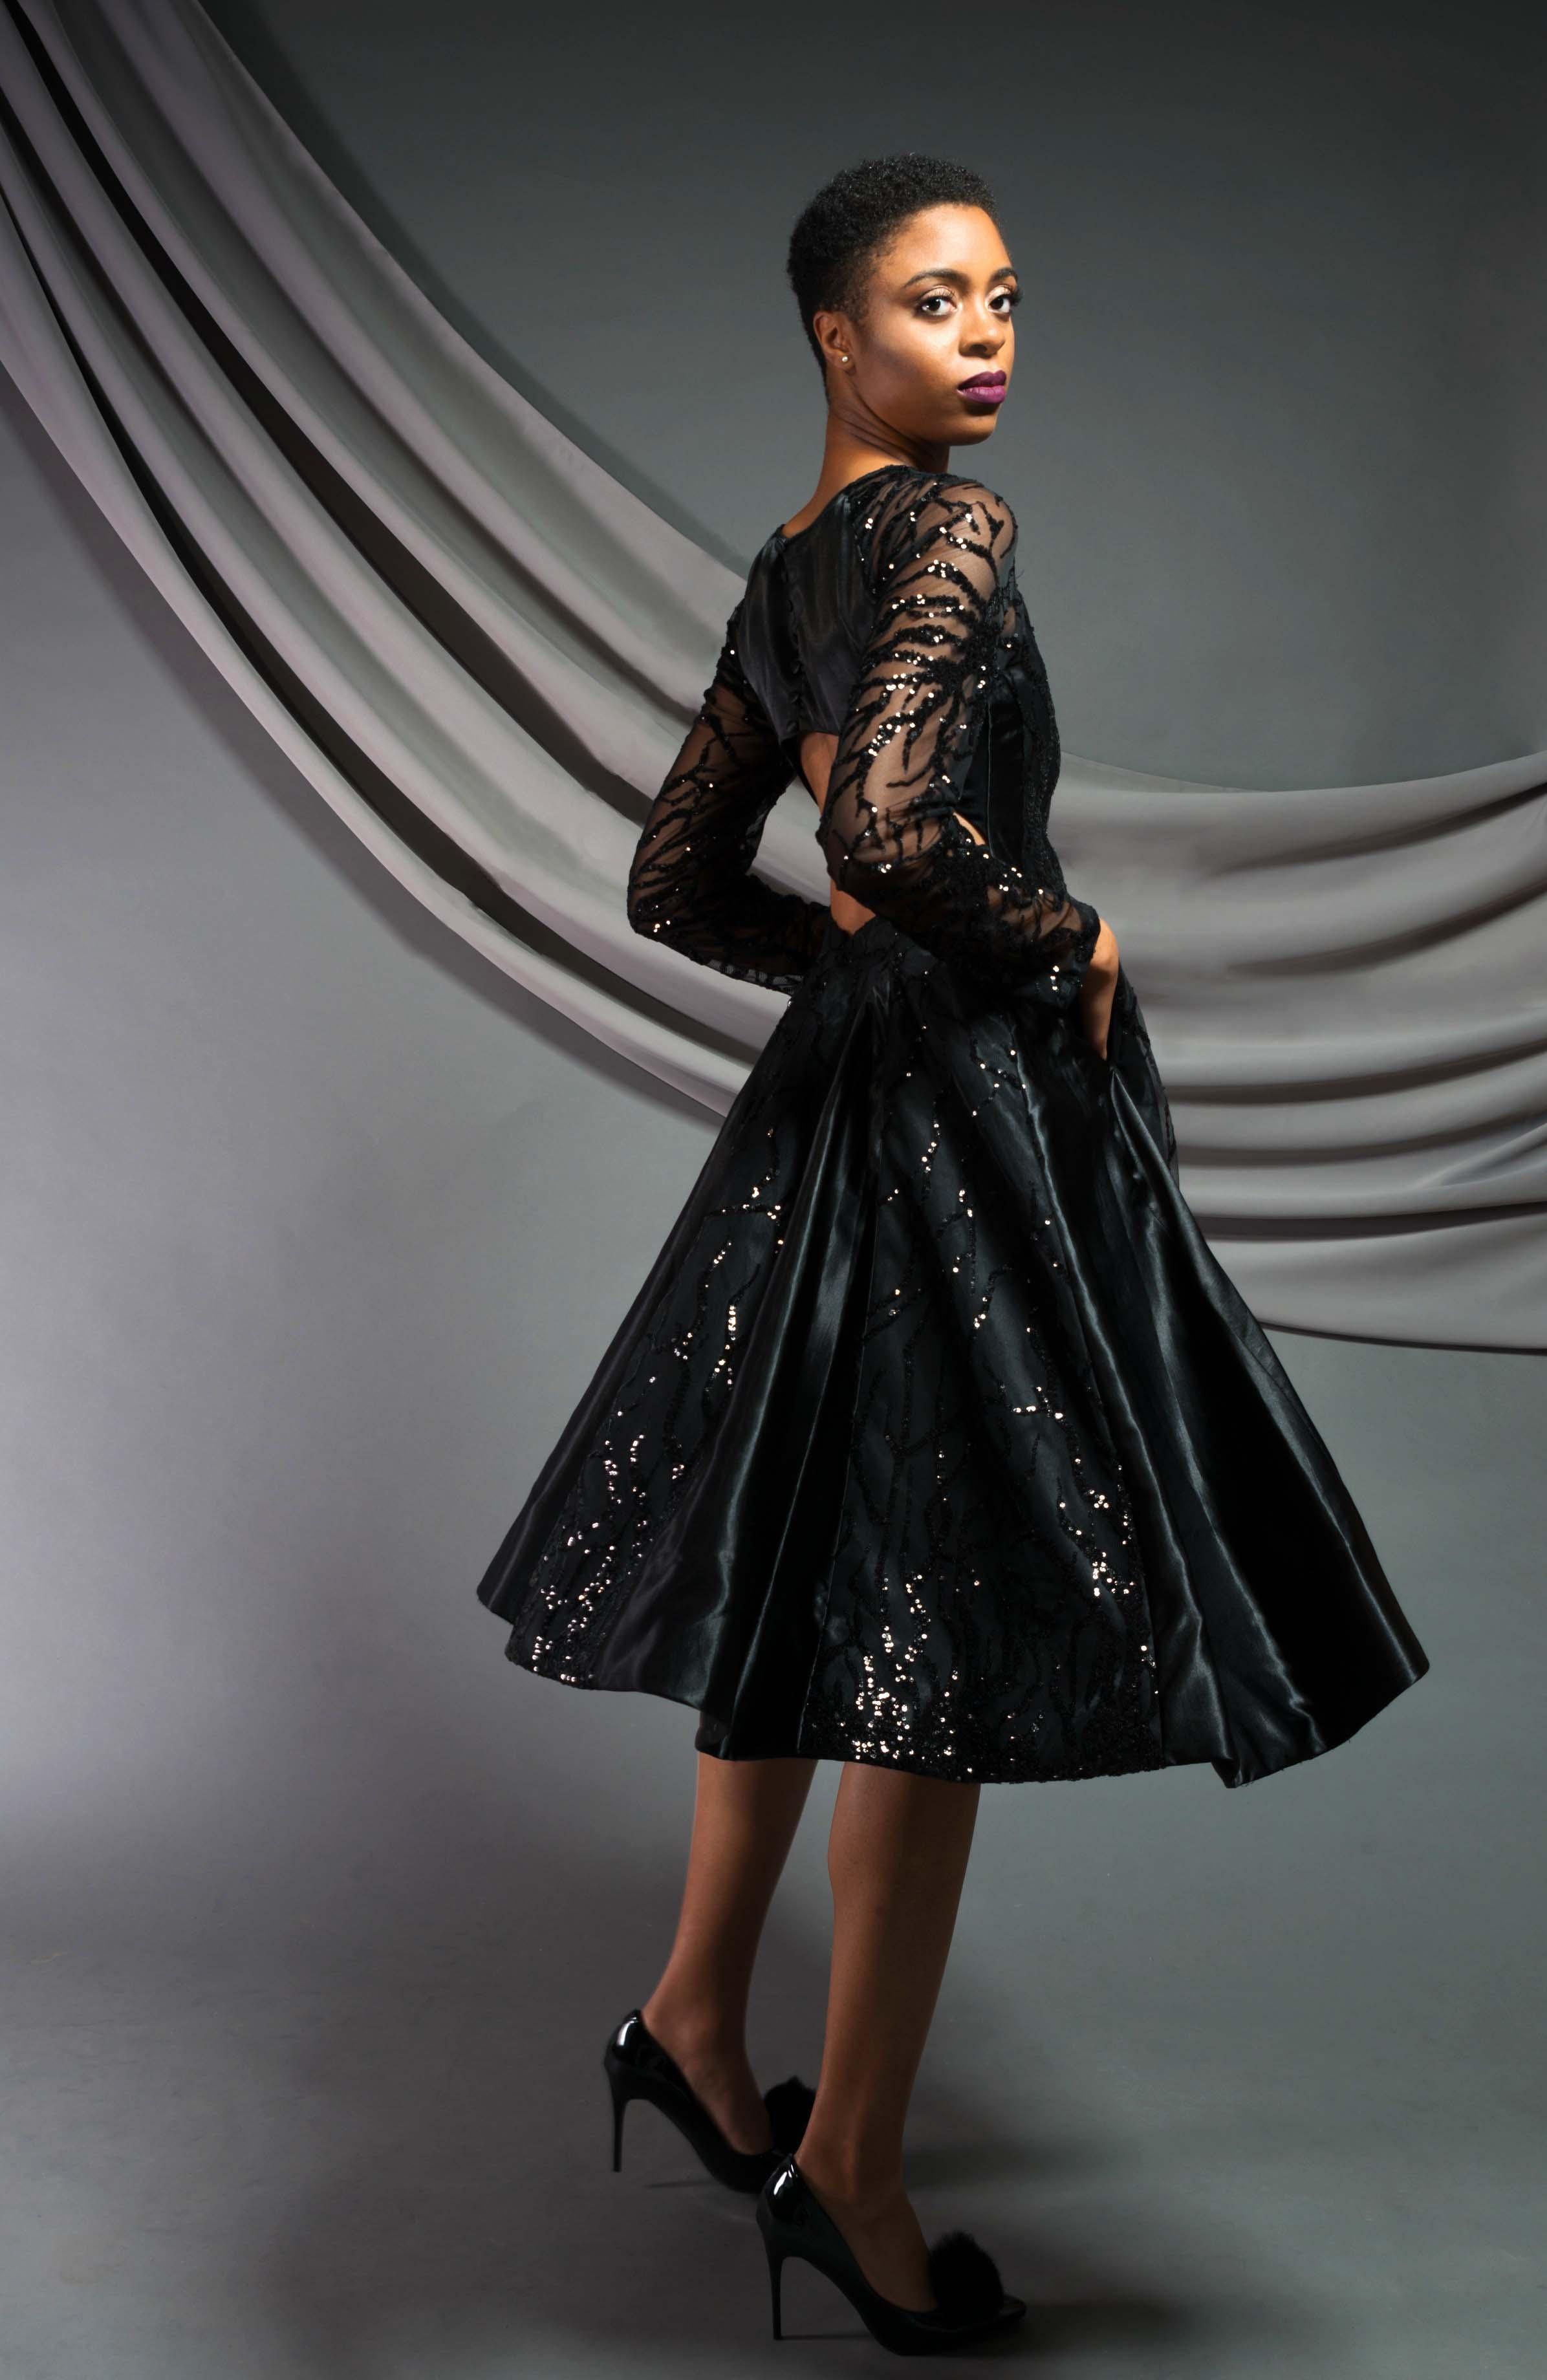 black-sequin-gown-lb-side.jpg